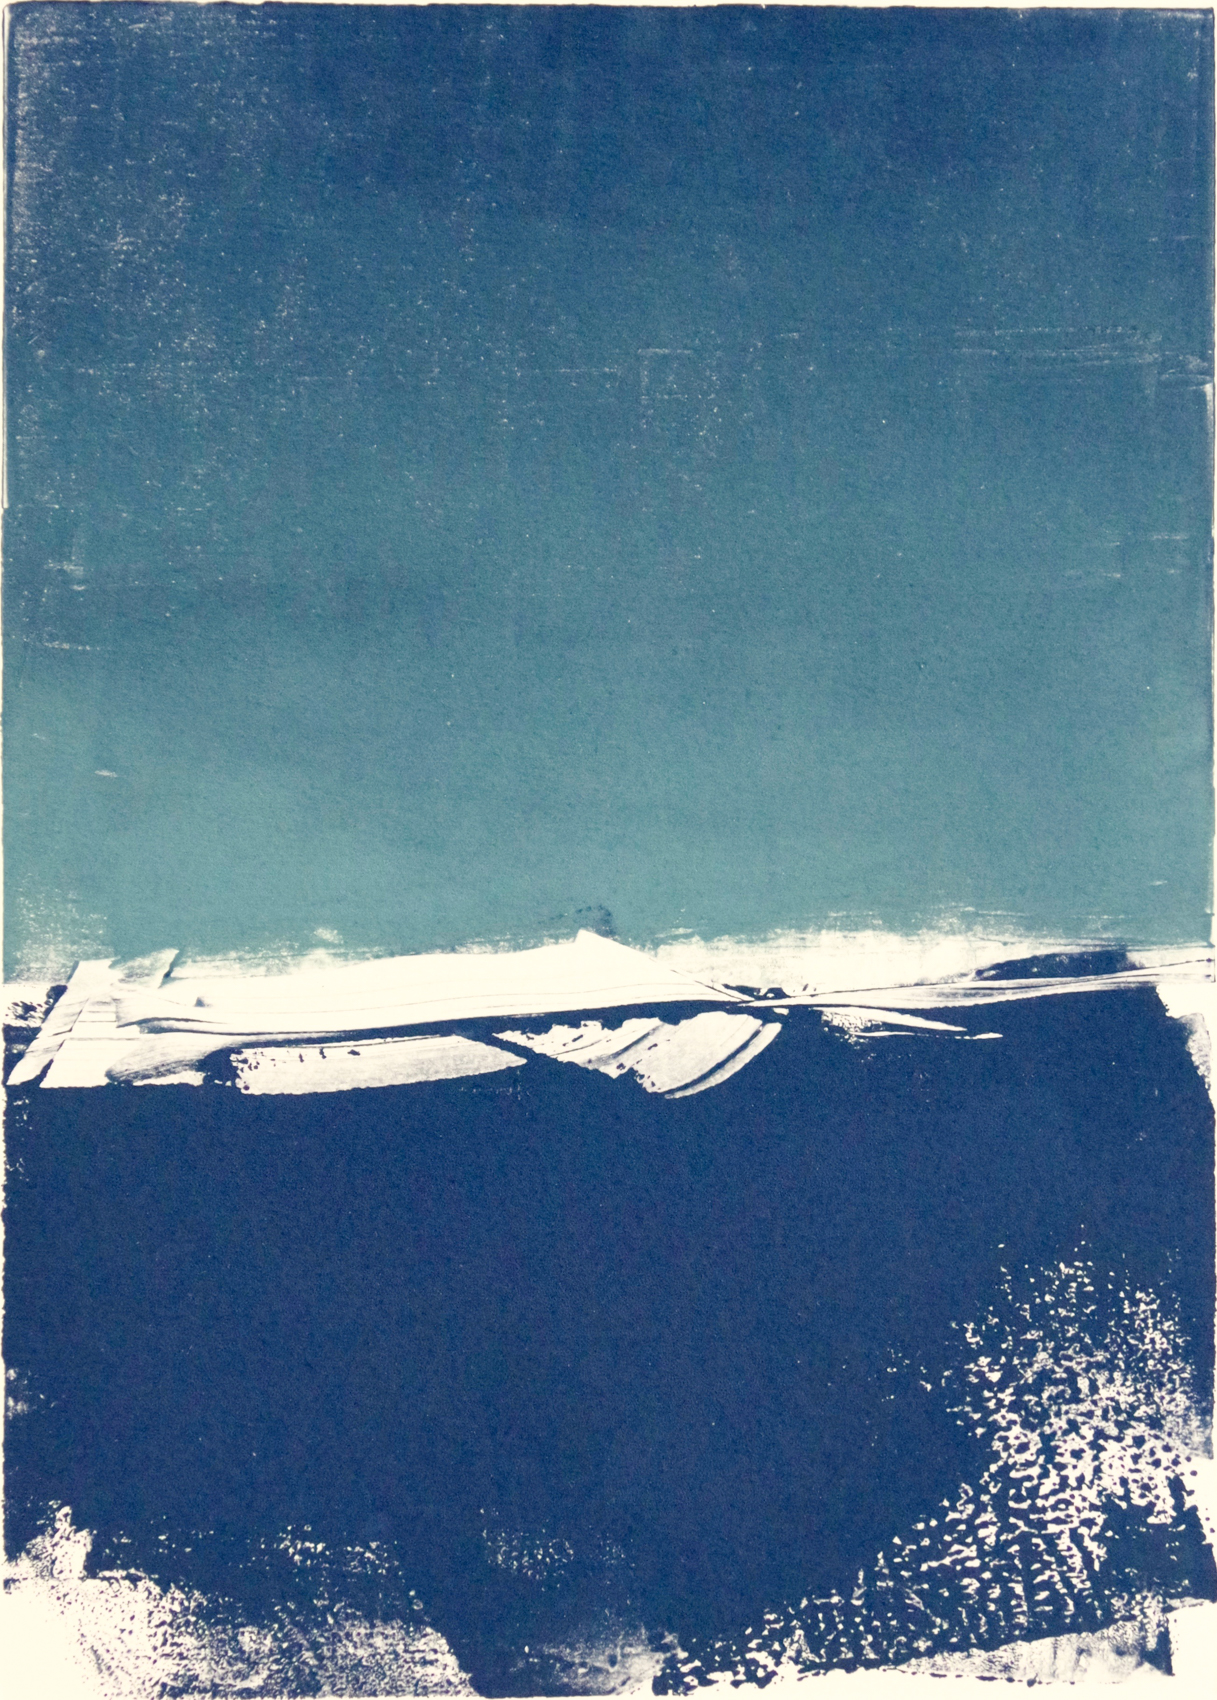 Ocean #5